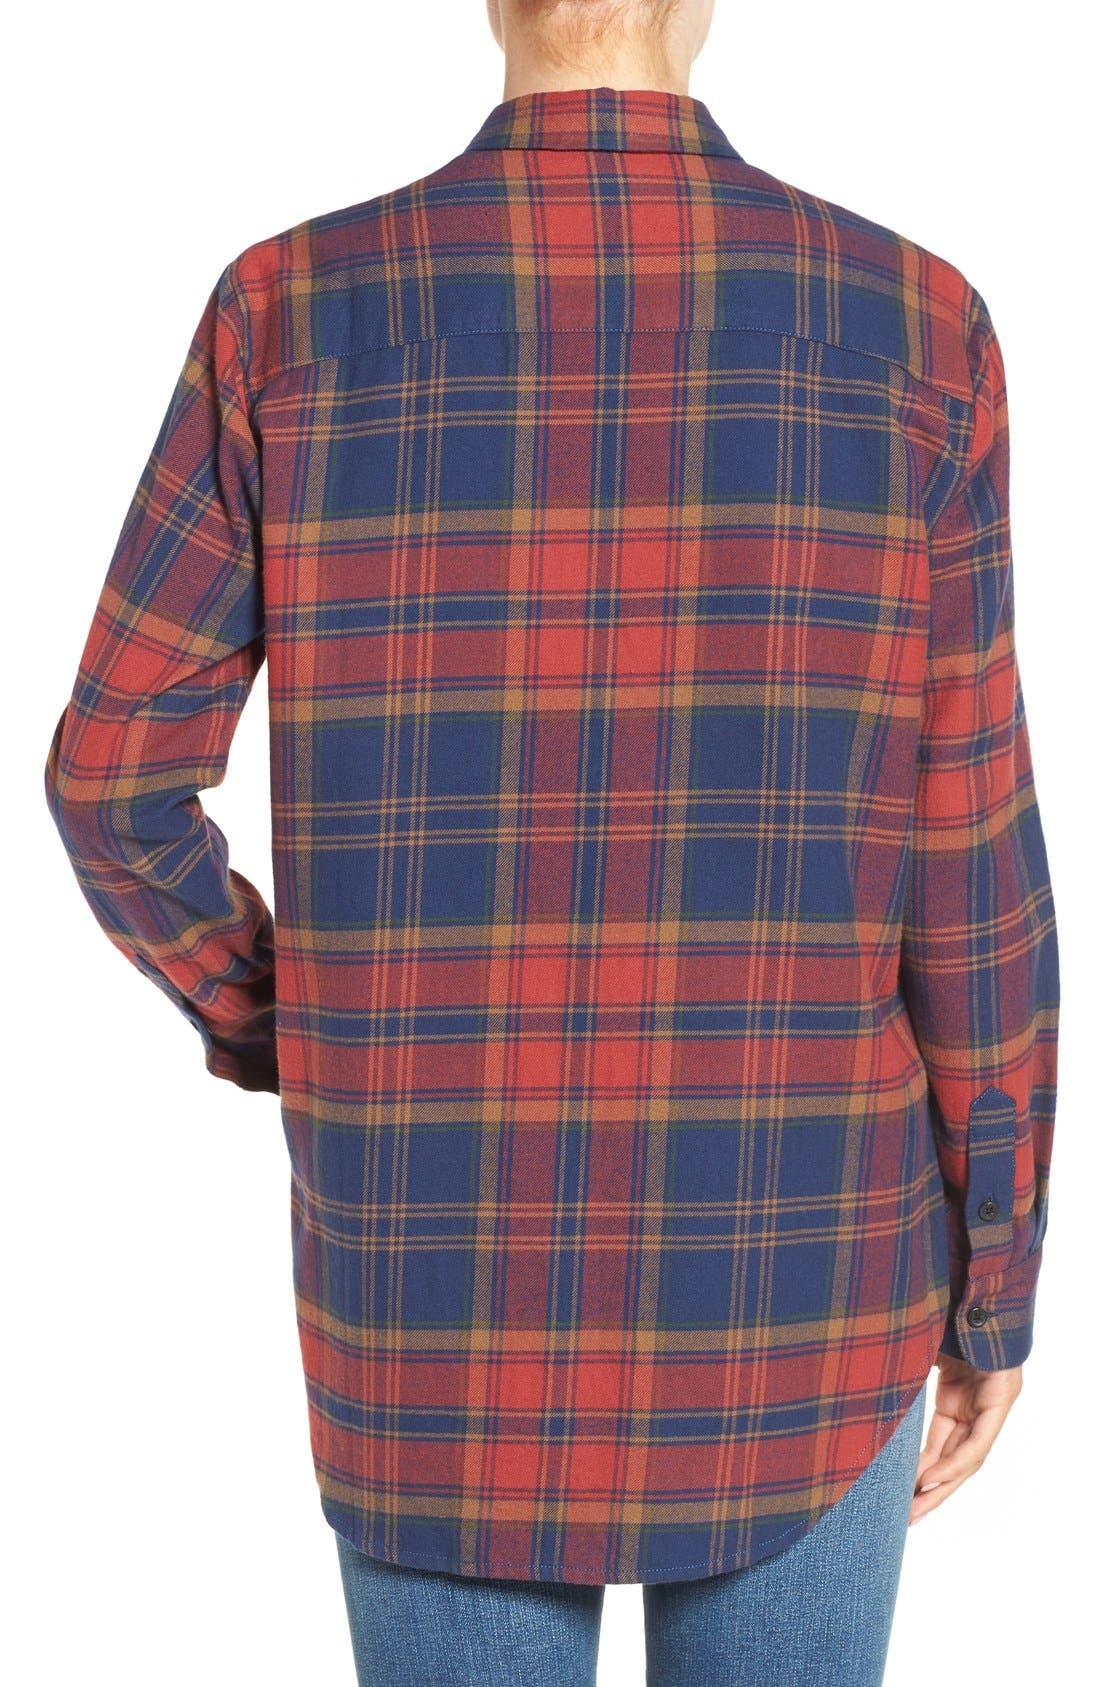 Ex-Boyfriend Shrunken Flannel Boyfriend Shirt,                             Alternate thumbnail 3, color,                             650